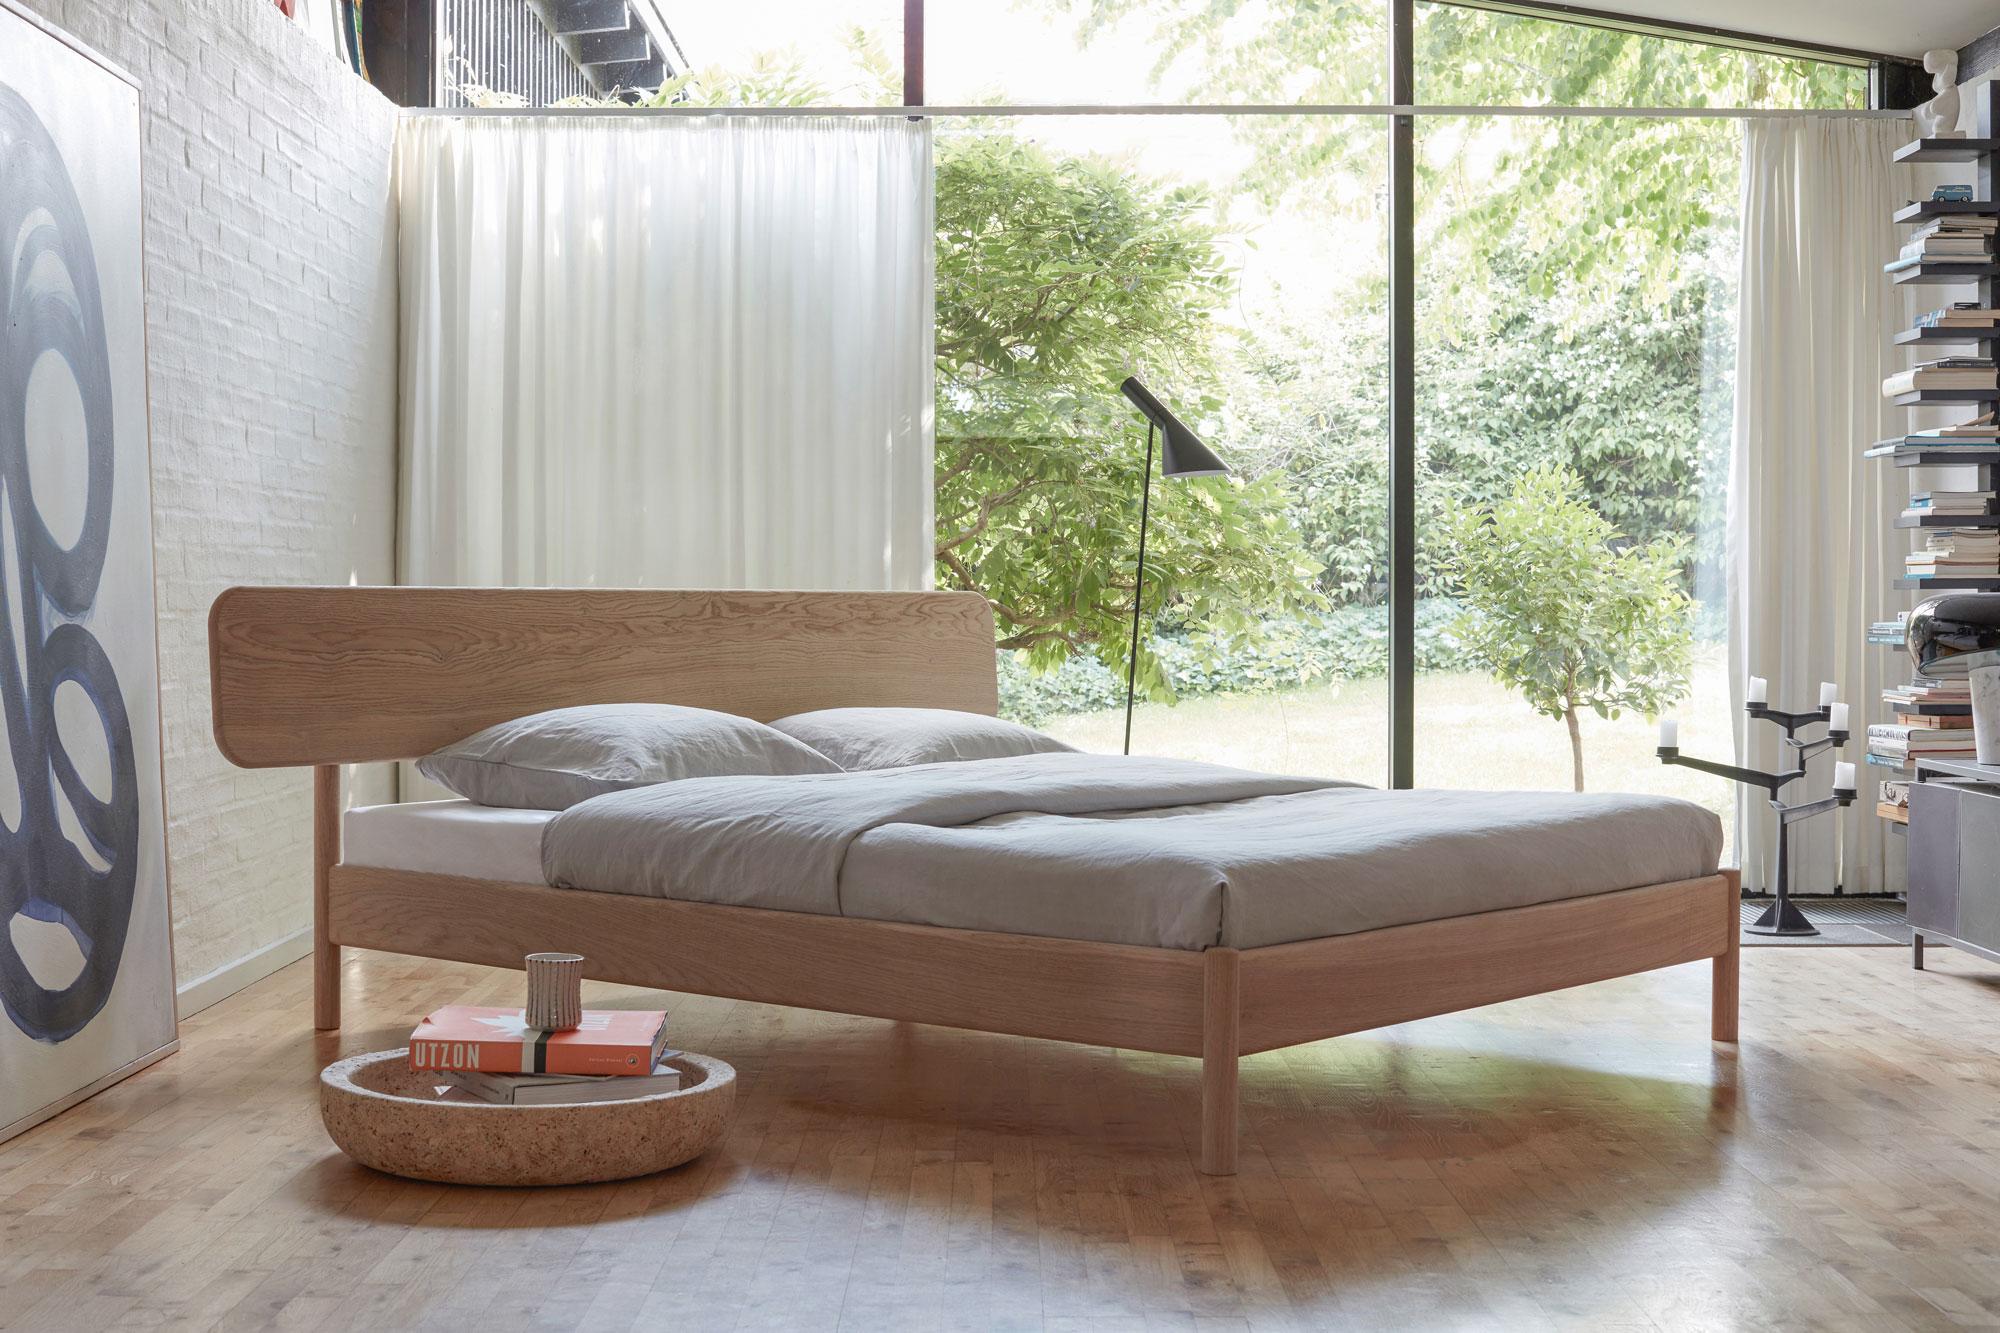 02---ALKEN-BED---RE-BEDS---DESIGN-BY-OLIVER-&-LUKAS-WEISSKROGH.jpg